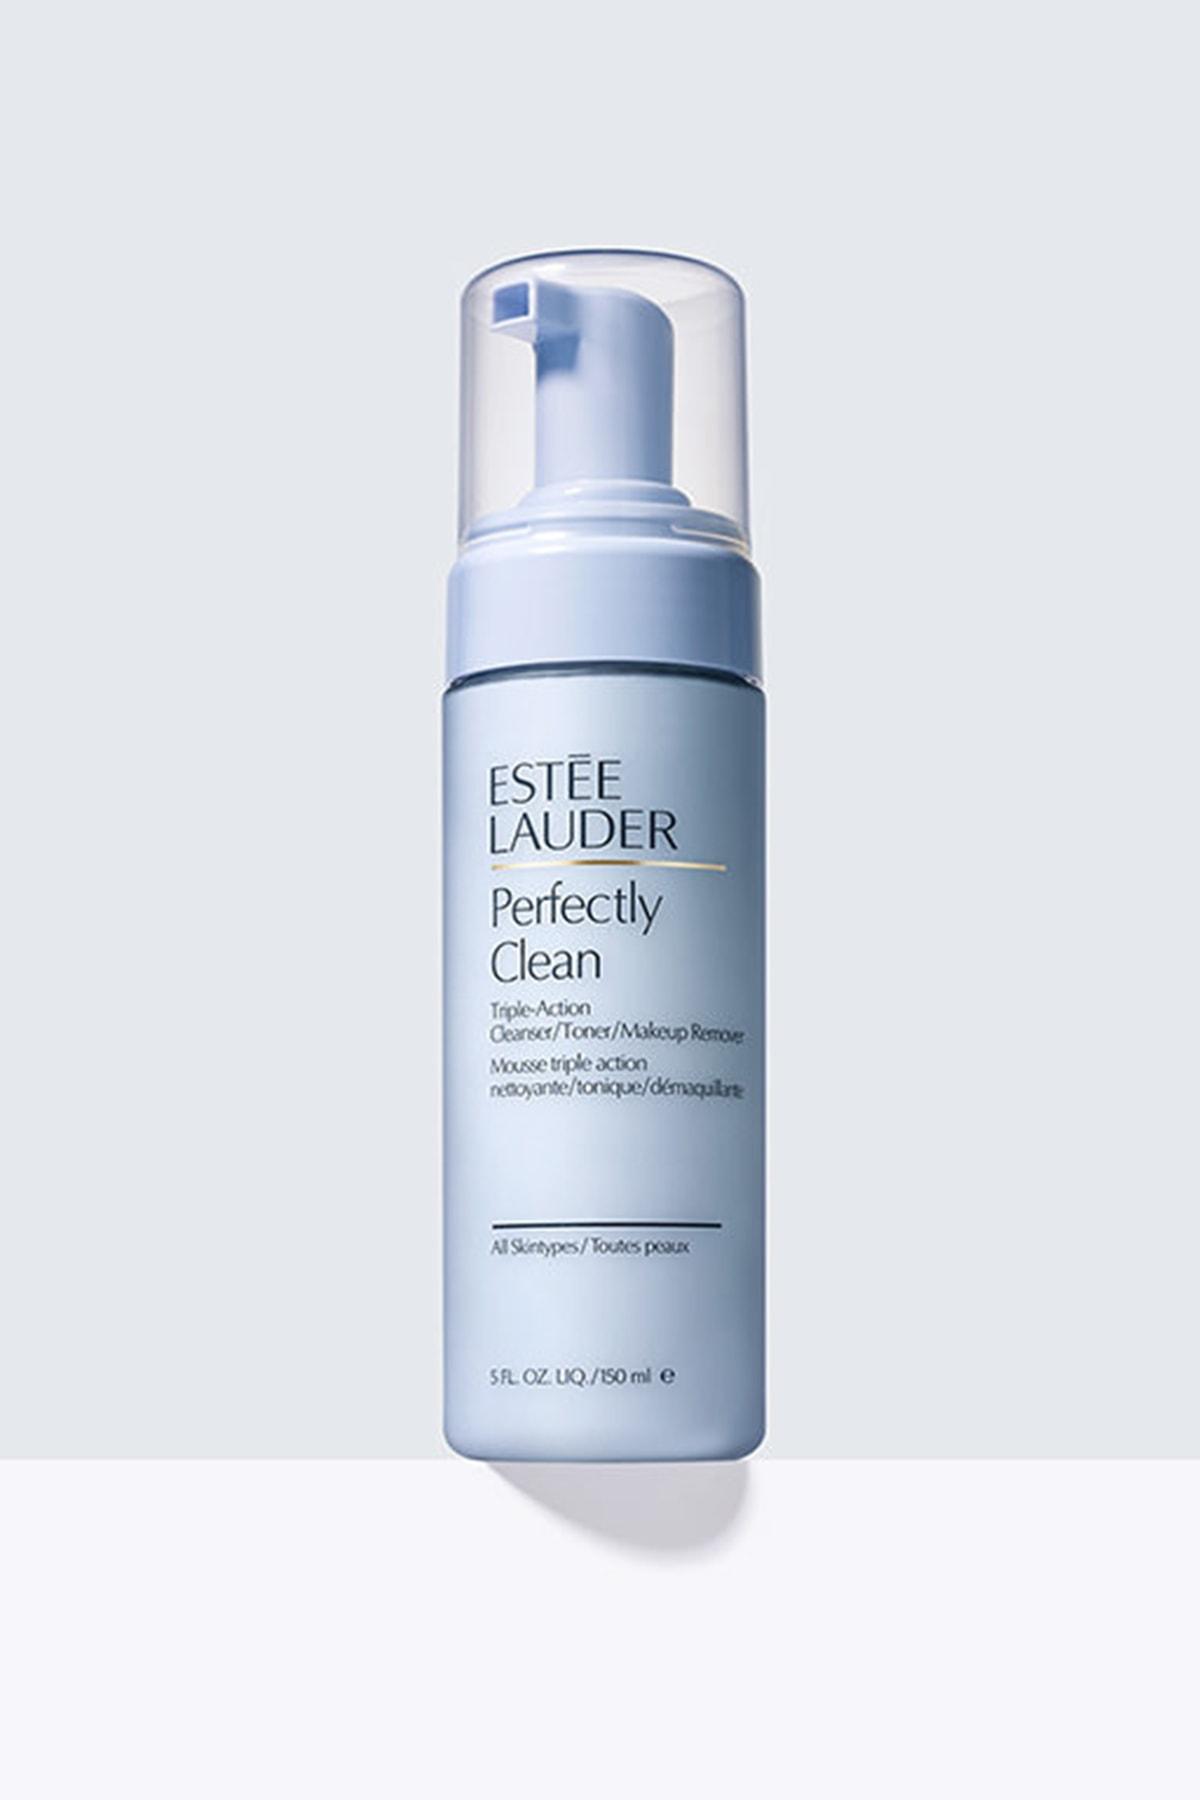 Estee Lauder 3 Etkili Yüz Temizleme Losyonu - Perfectly Clean Triple Action 15 ml 027131988090 1